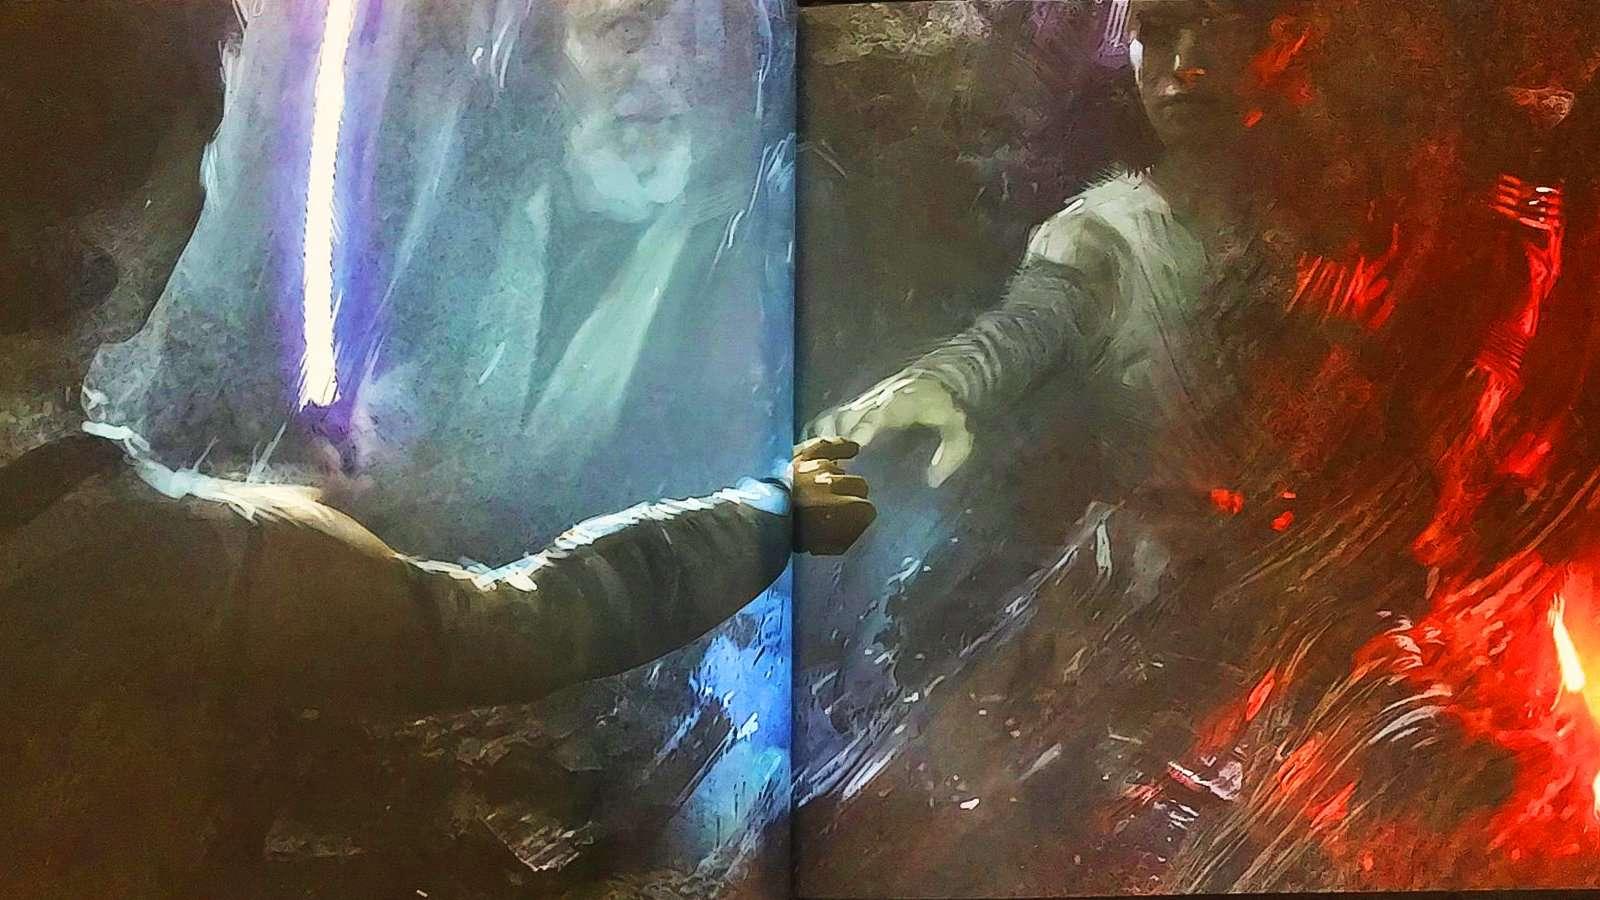 concept art de Gli Ultimi Jedi, Ben Kenobi in un concept art inedito de Gli Ultimi Jedi, Star Wars Addicted